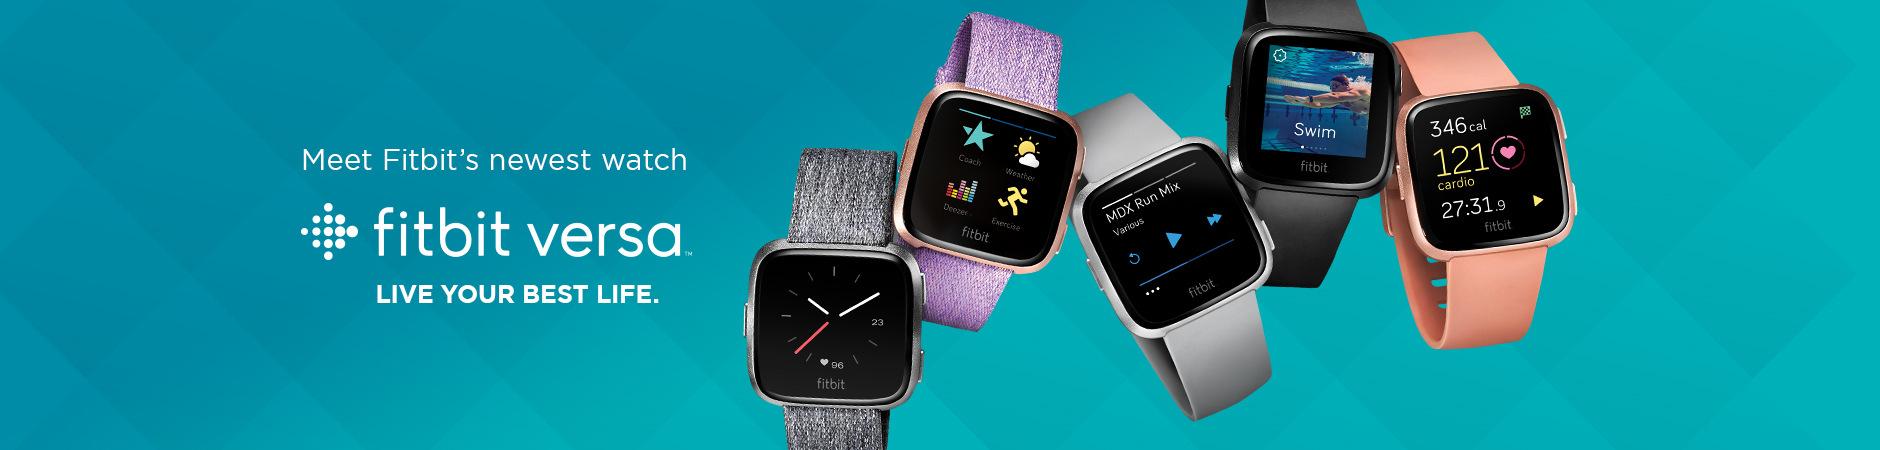 Meet Fitbit's newest watch - Fitbit Versa